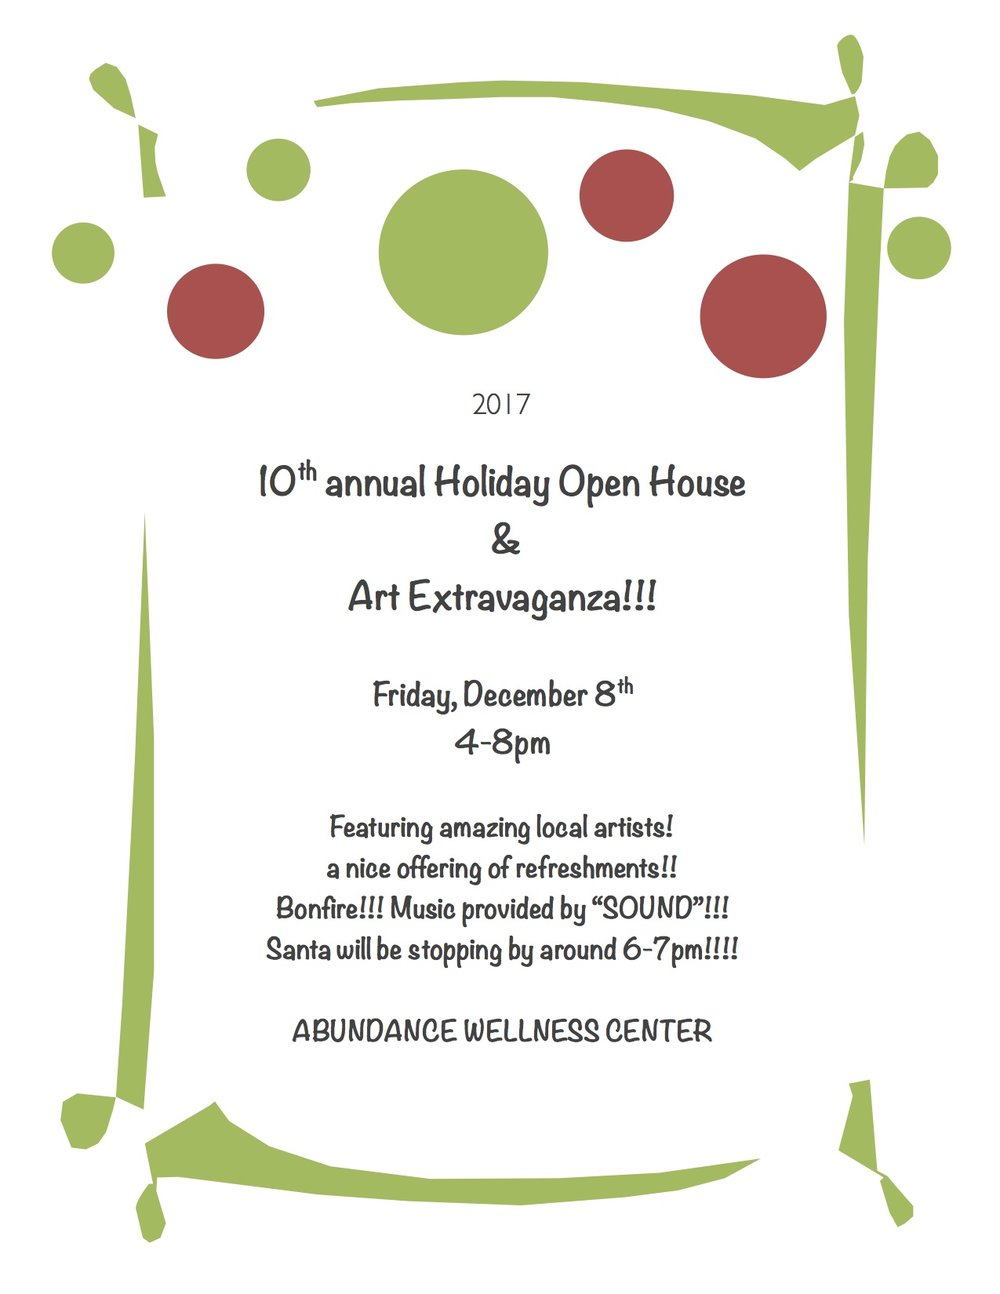 2017 Holiday party Abundance Wellness Center.jpg